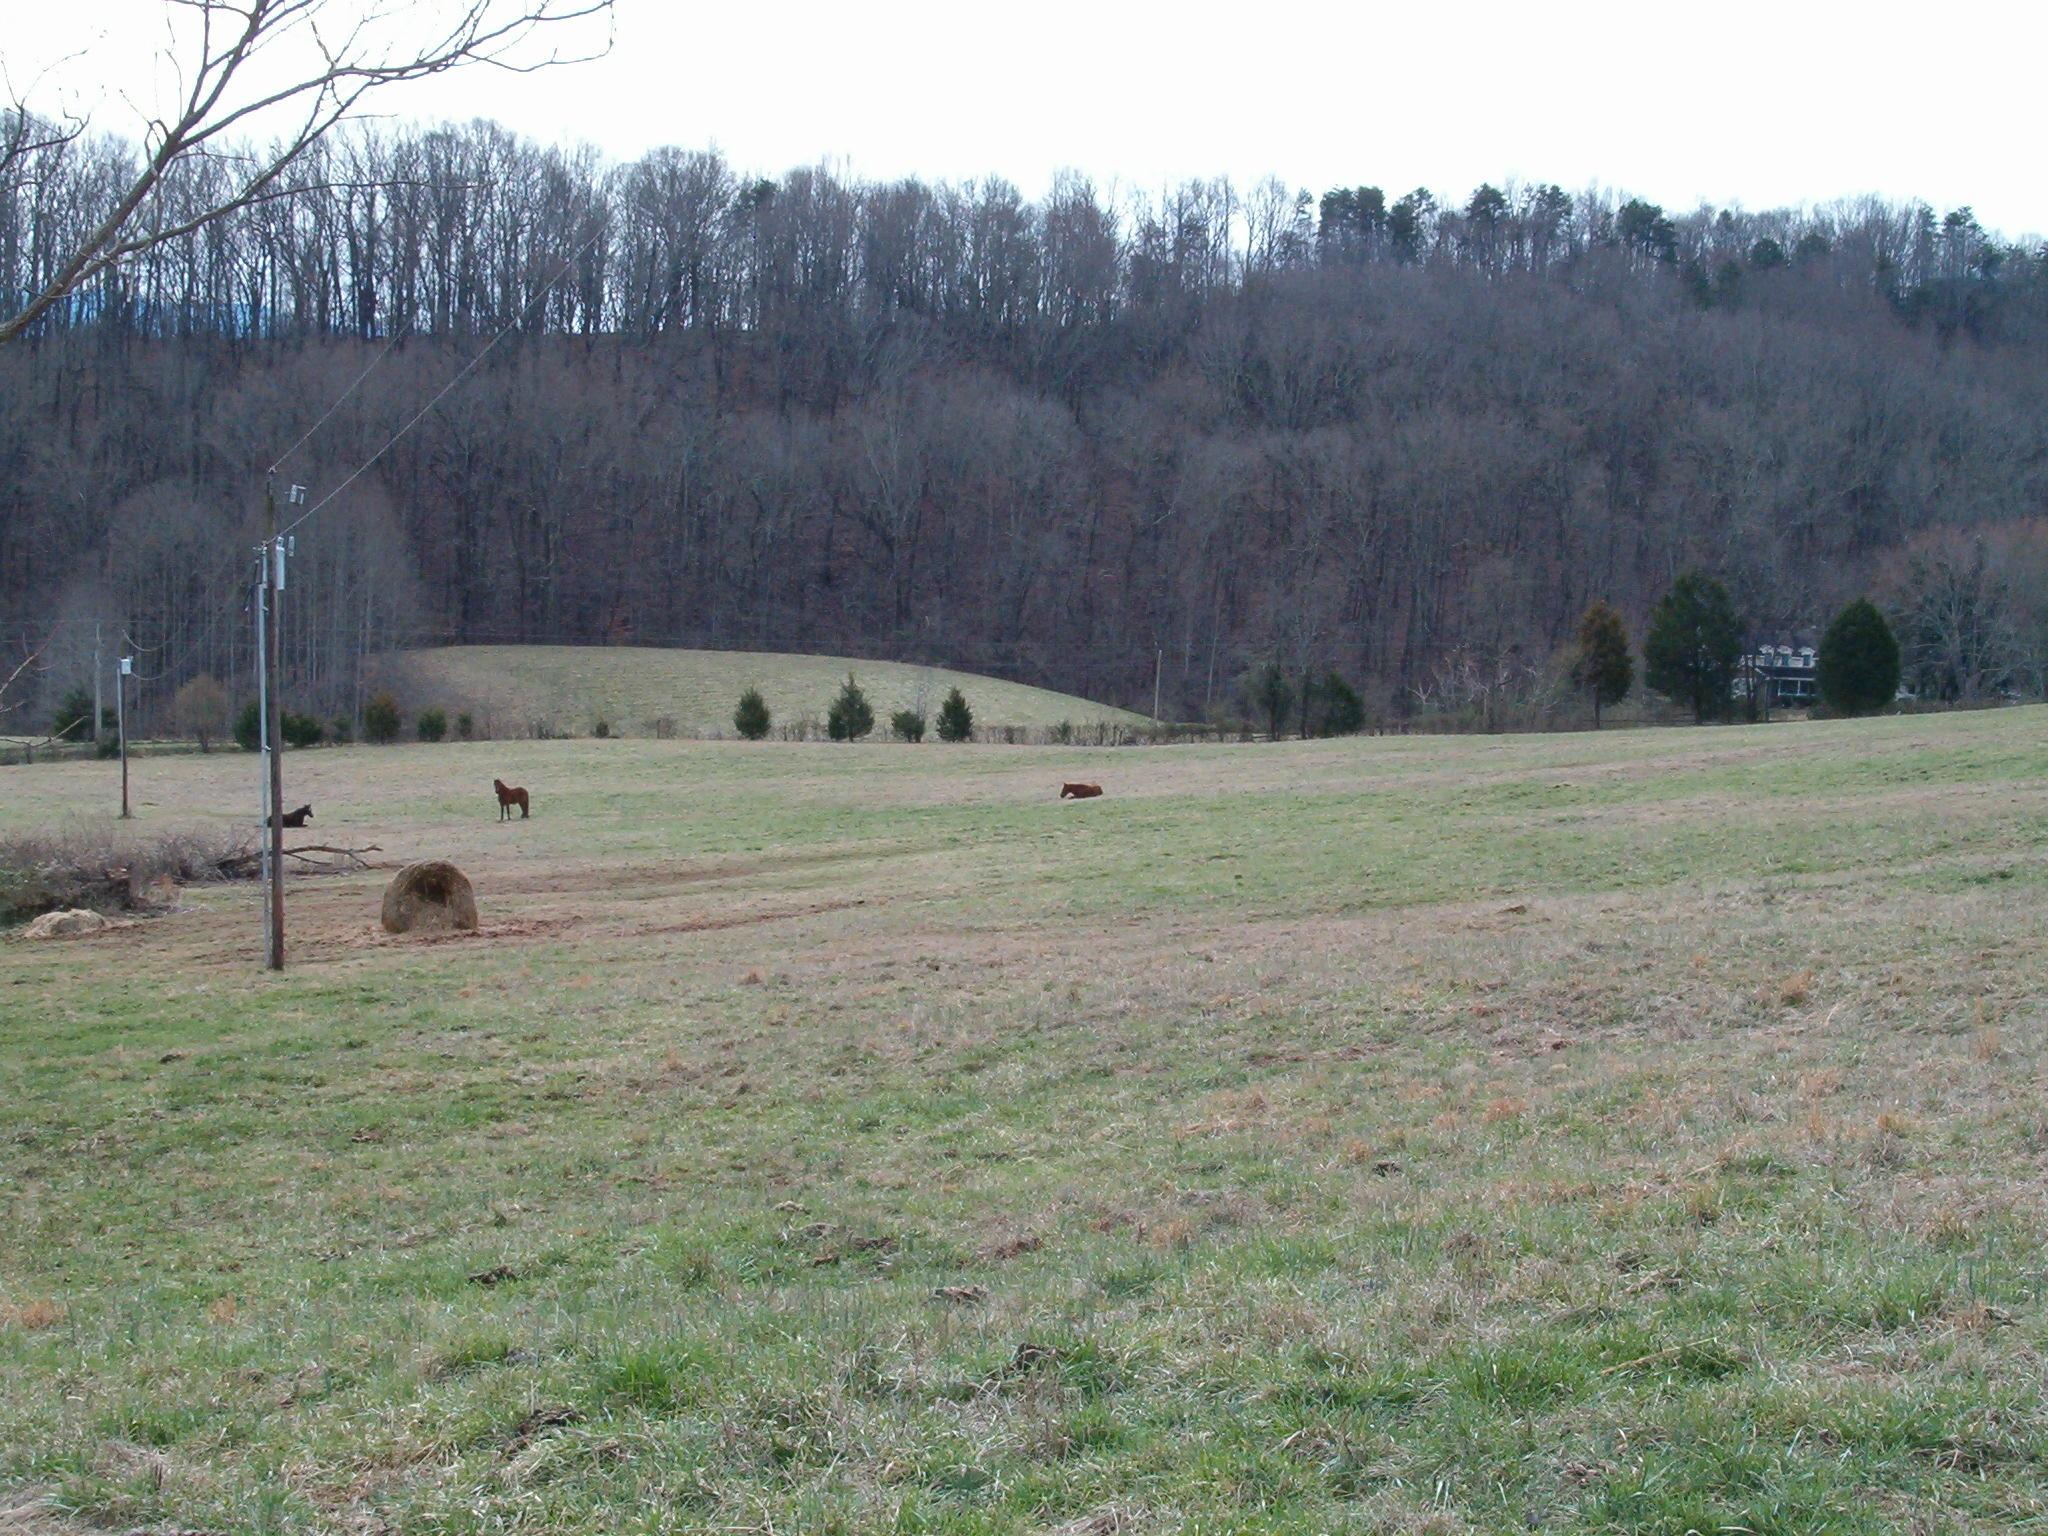 369 Craighead Rd, Madisonville, Tennessee 37354, 3 Bedrooms Bedrooms, ,3 BathroomsBathrooms,Single Family,For Sale,Craighead,1069898